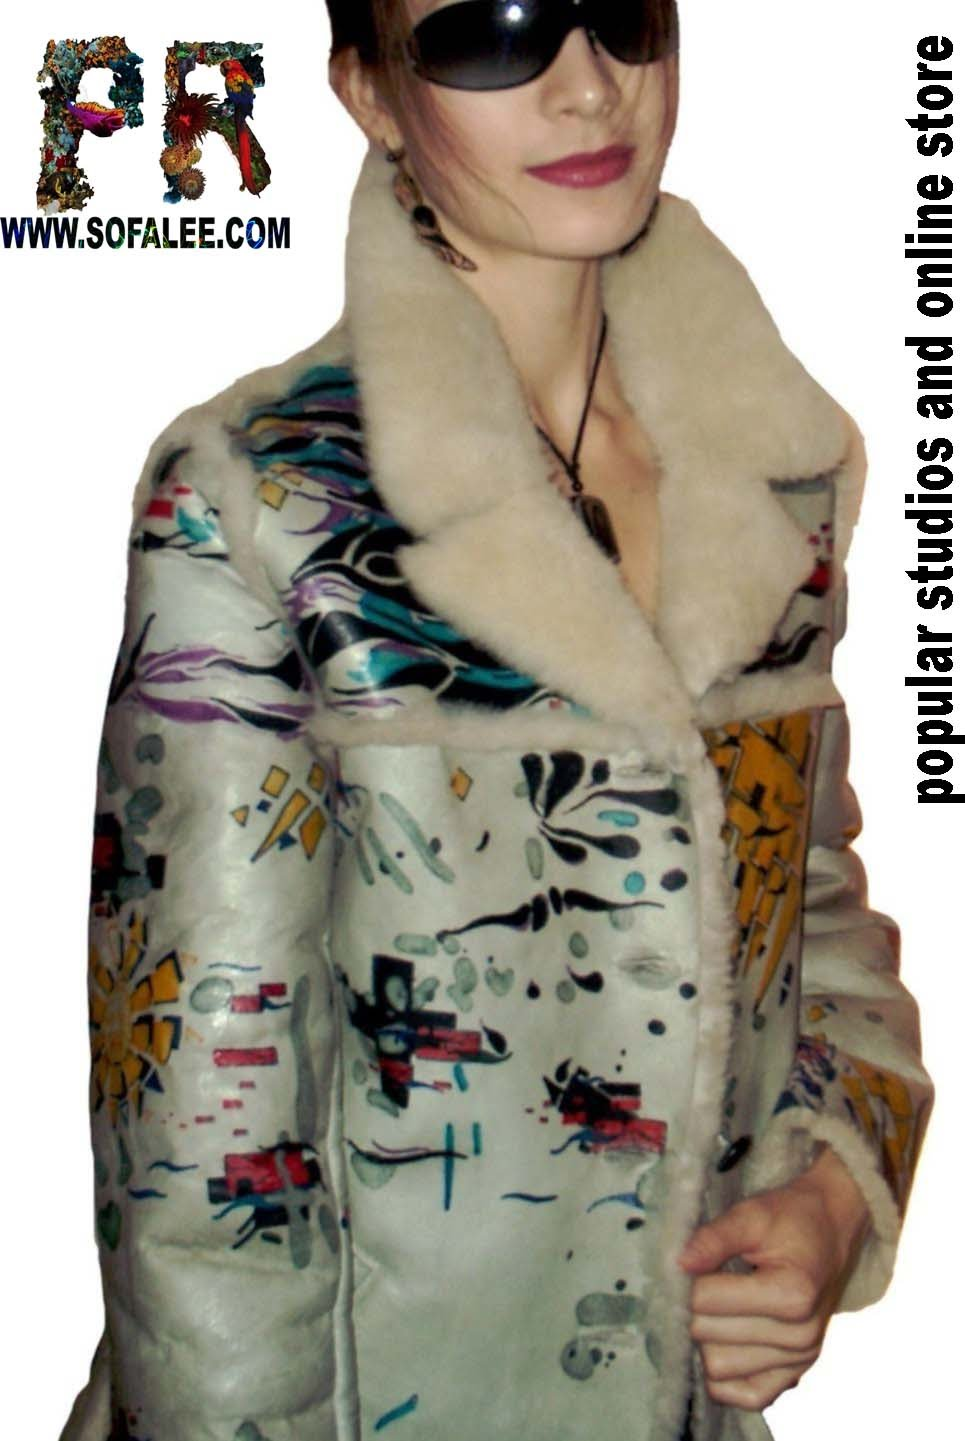 https://sites.google.com/a/sofalee.com/handmade-leather-jacets/sheepskin-coats-collection/%D0%94%D1%83%D0%B1%D0%BB%D1%91%D0%BD%D0%BA%D0%B0%20%D1%86%D0%B2%D0%B5%D1%82%D0%BD%D0%B0%D1%8F%202.jpg?attredirects=0